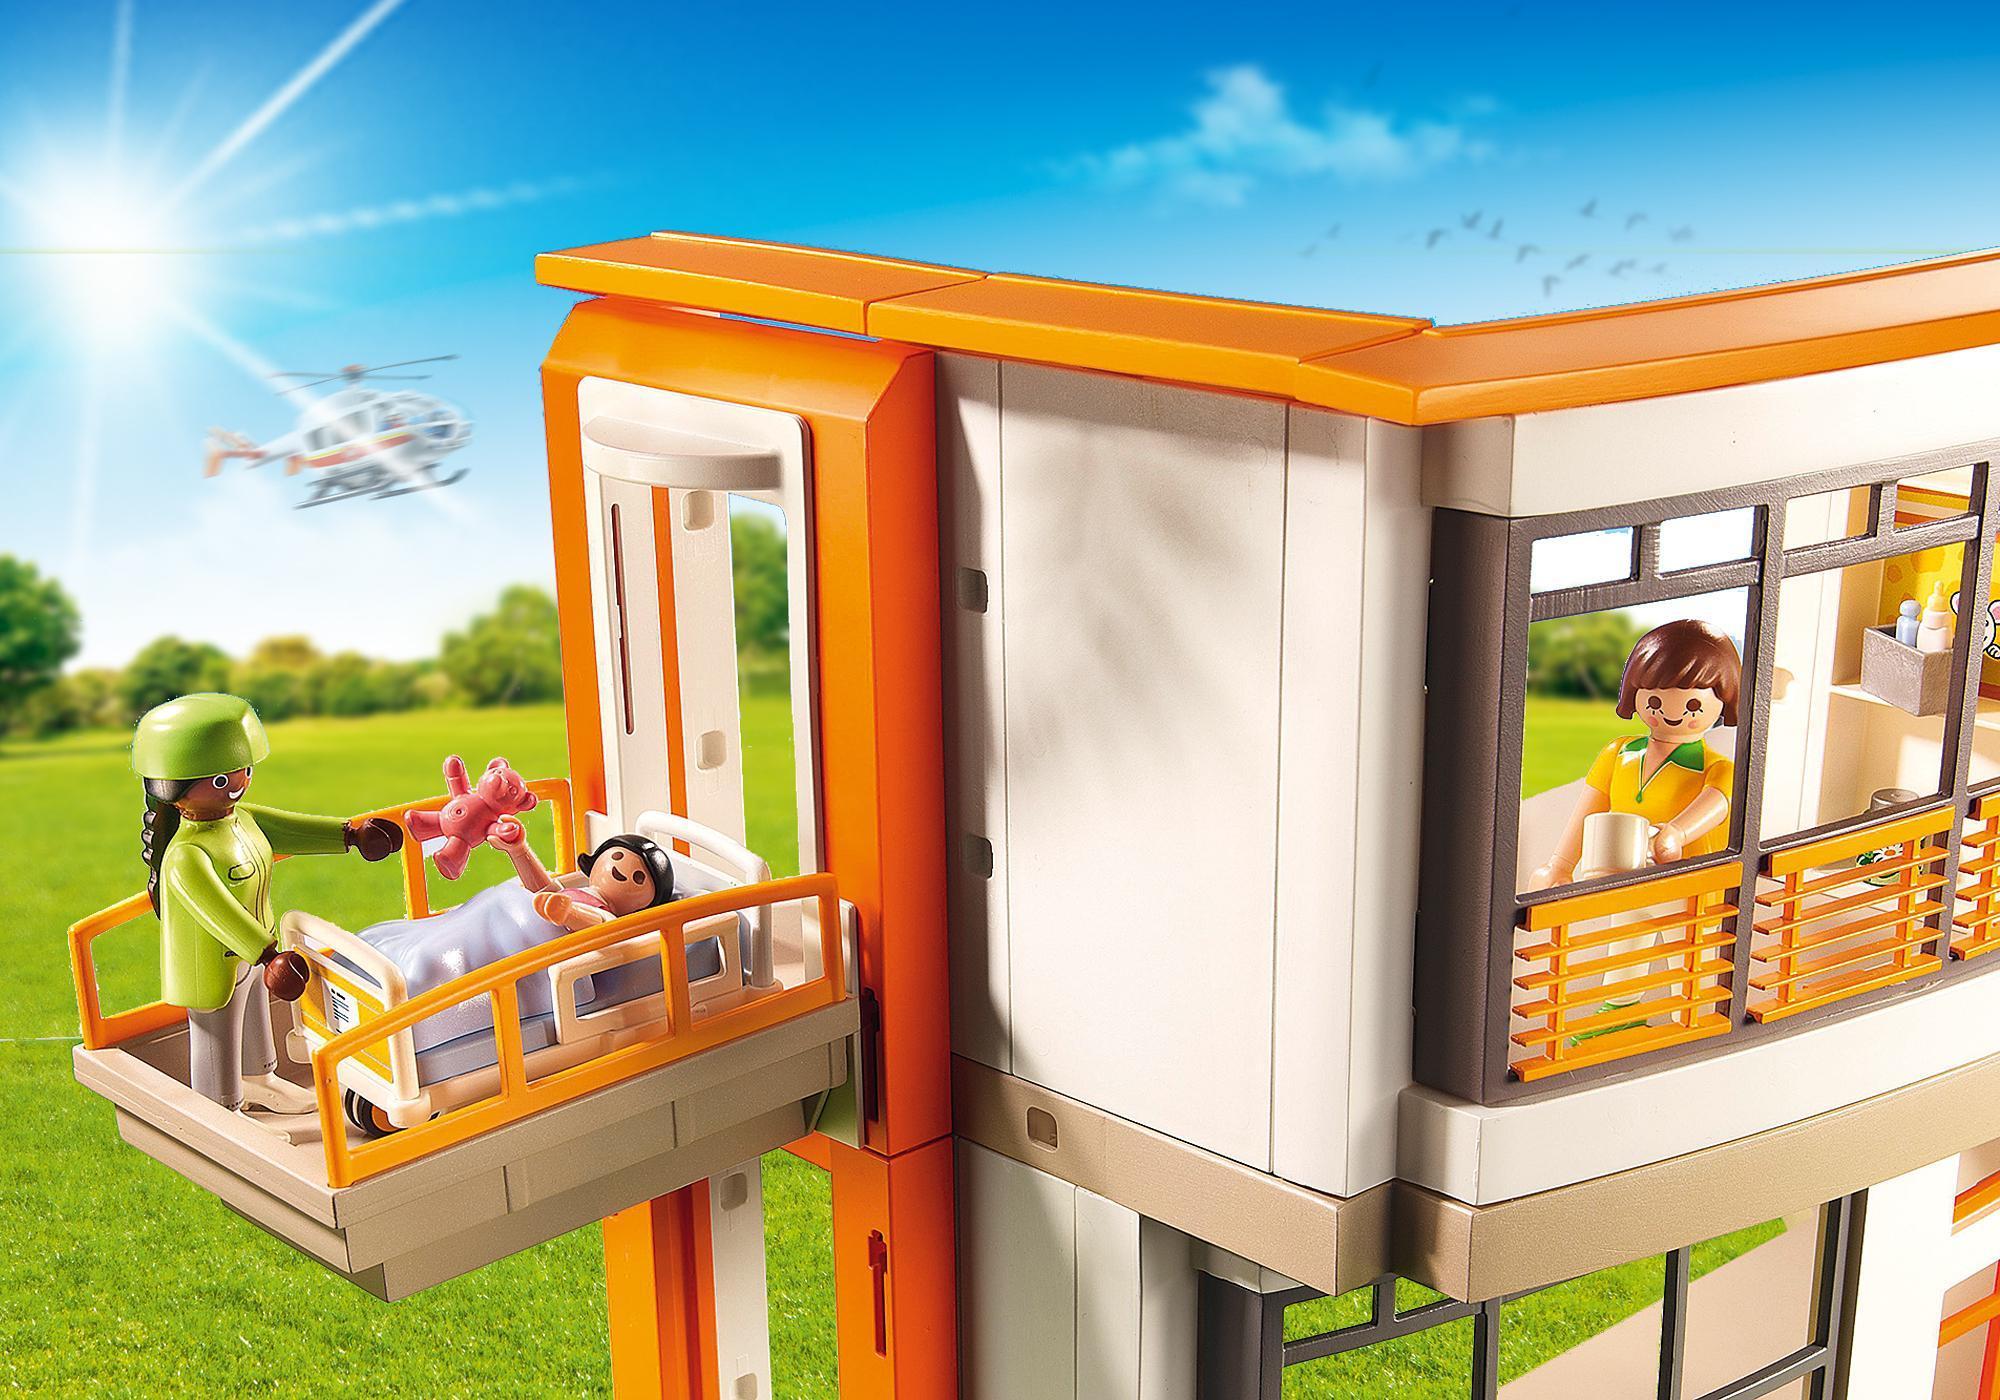 http://media.playmobil.com/i/playmobil/6657_product_extra4/Kinderklinik mit Einrichtung